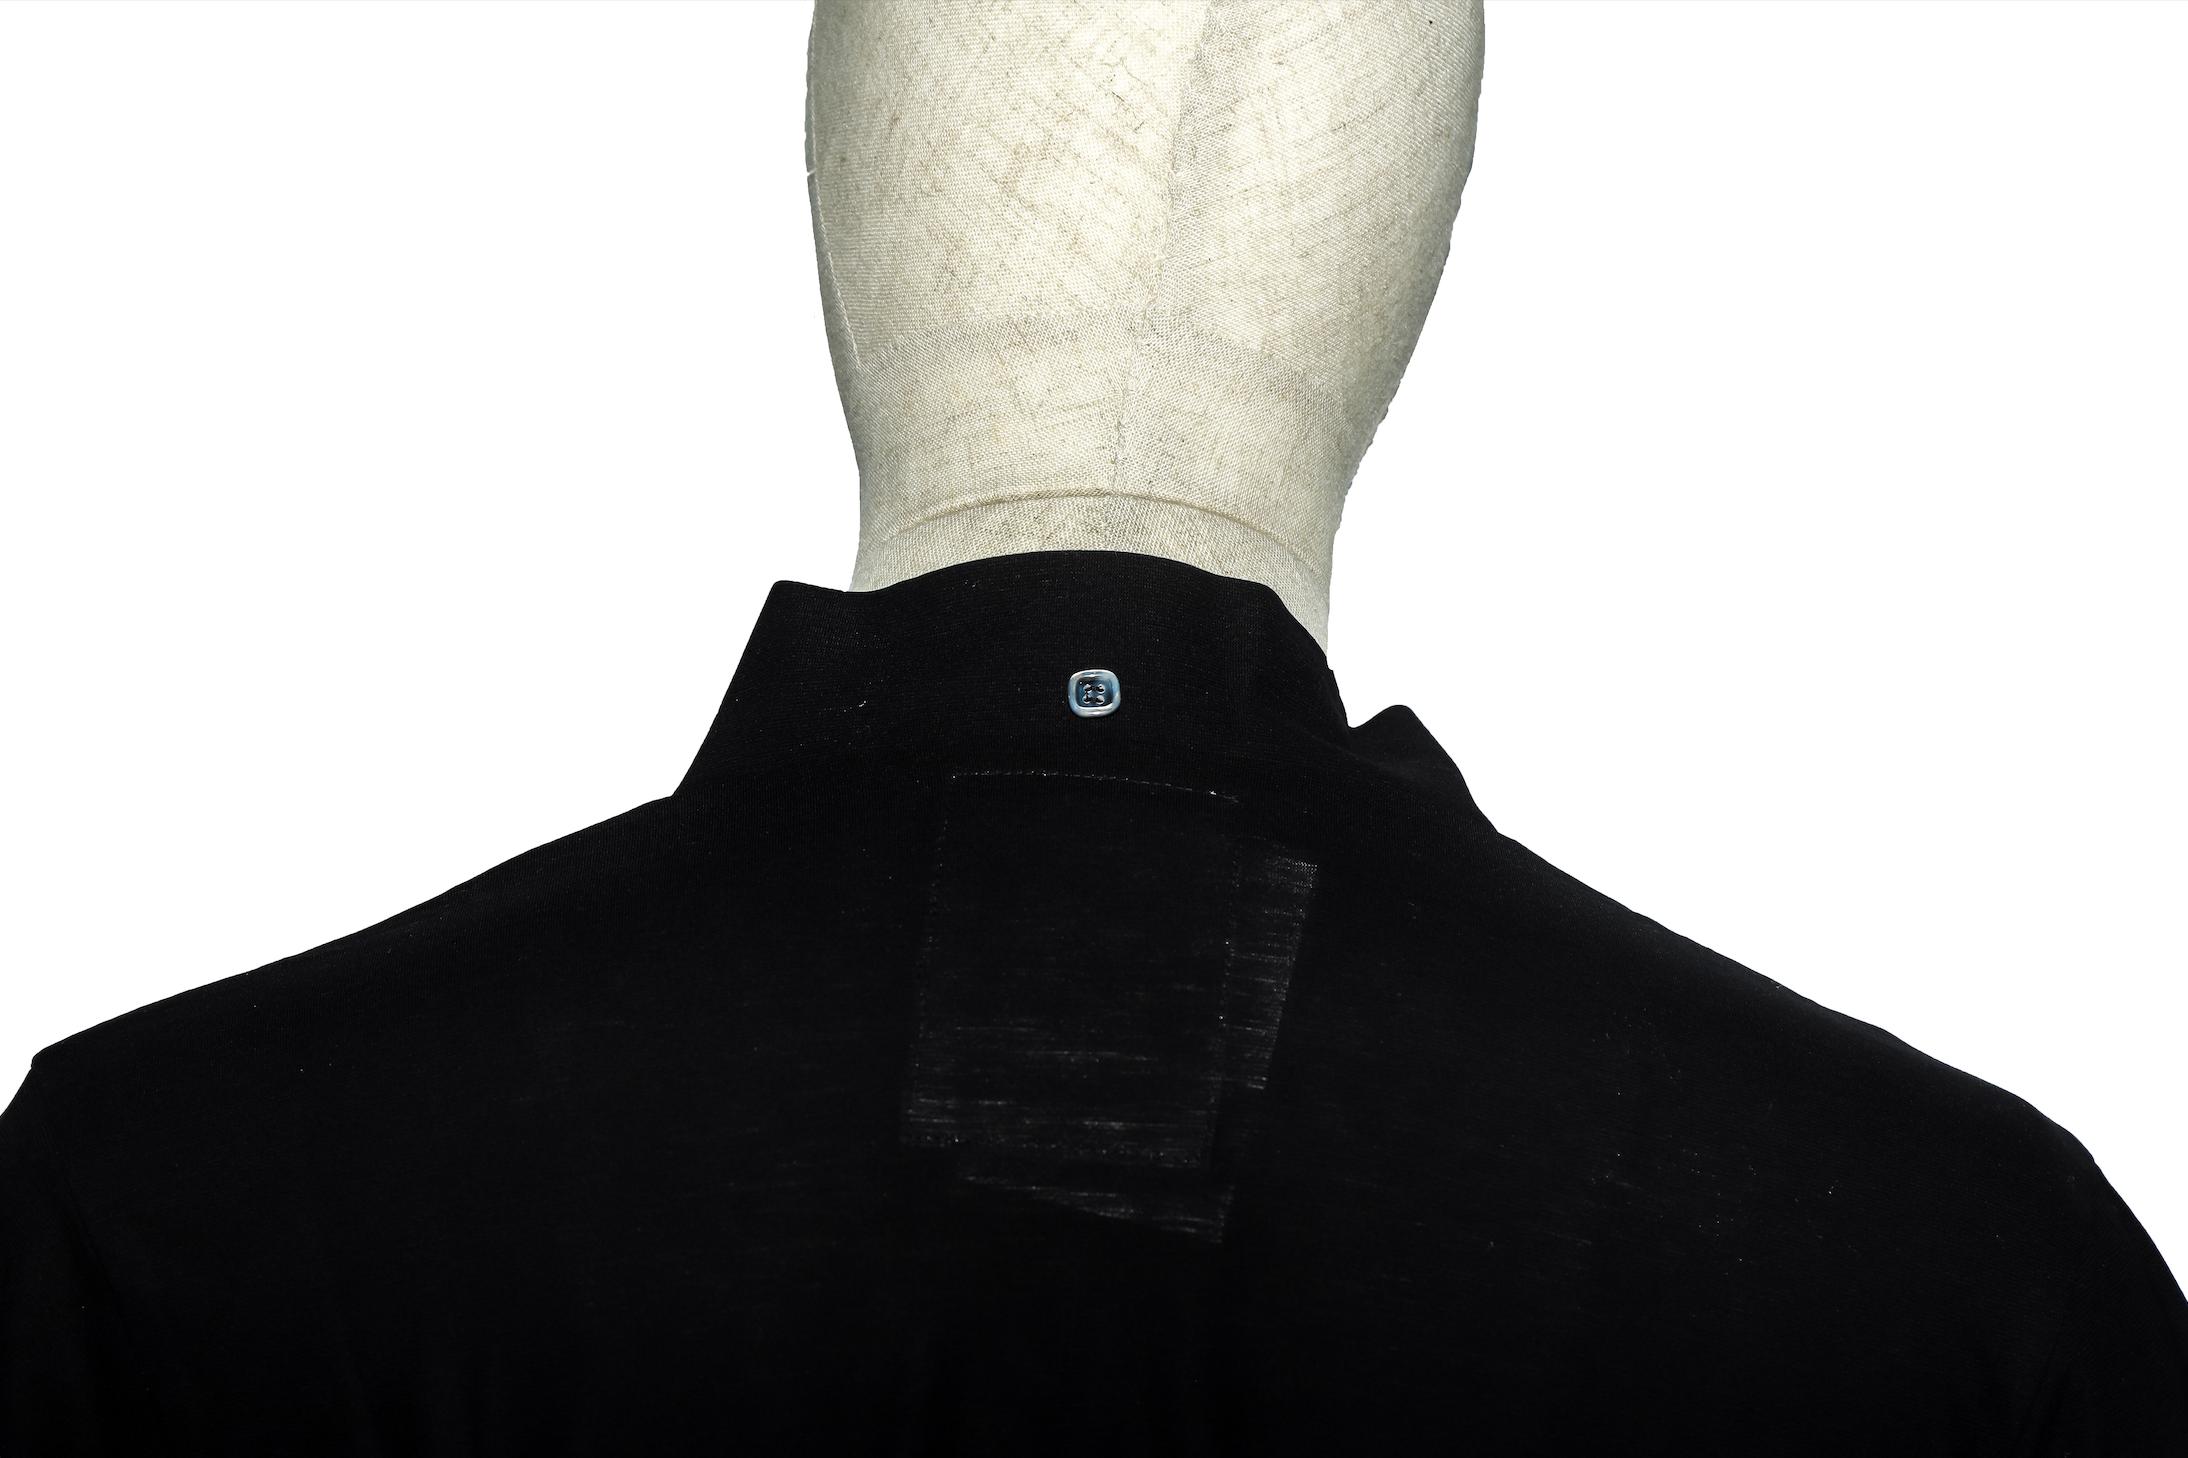 Tシャツ襦袢 半袖